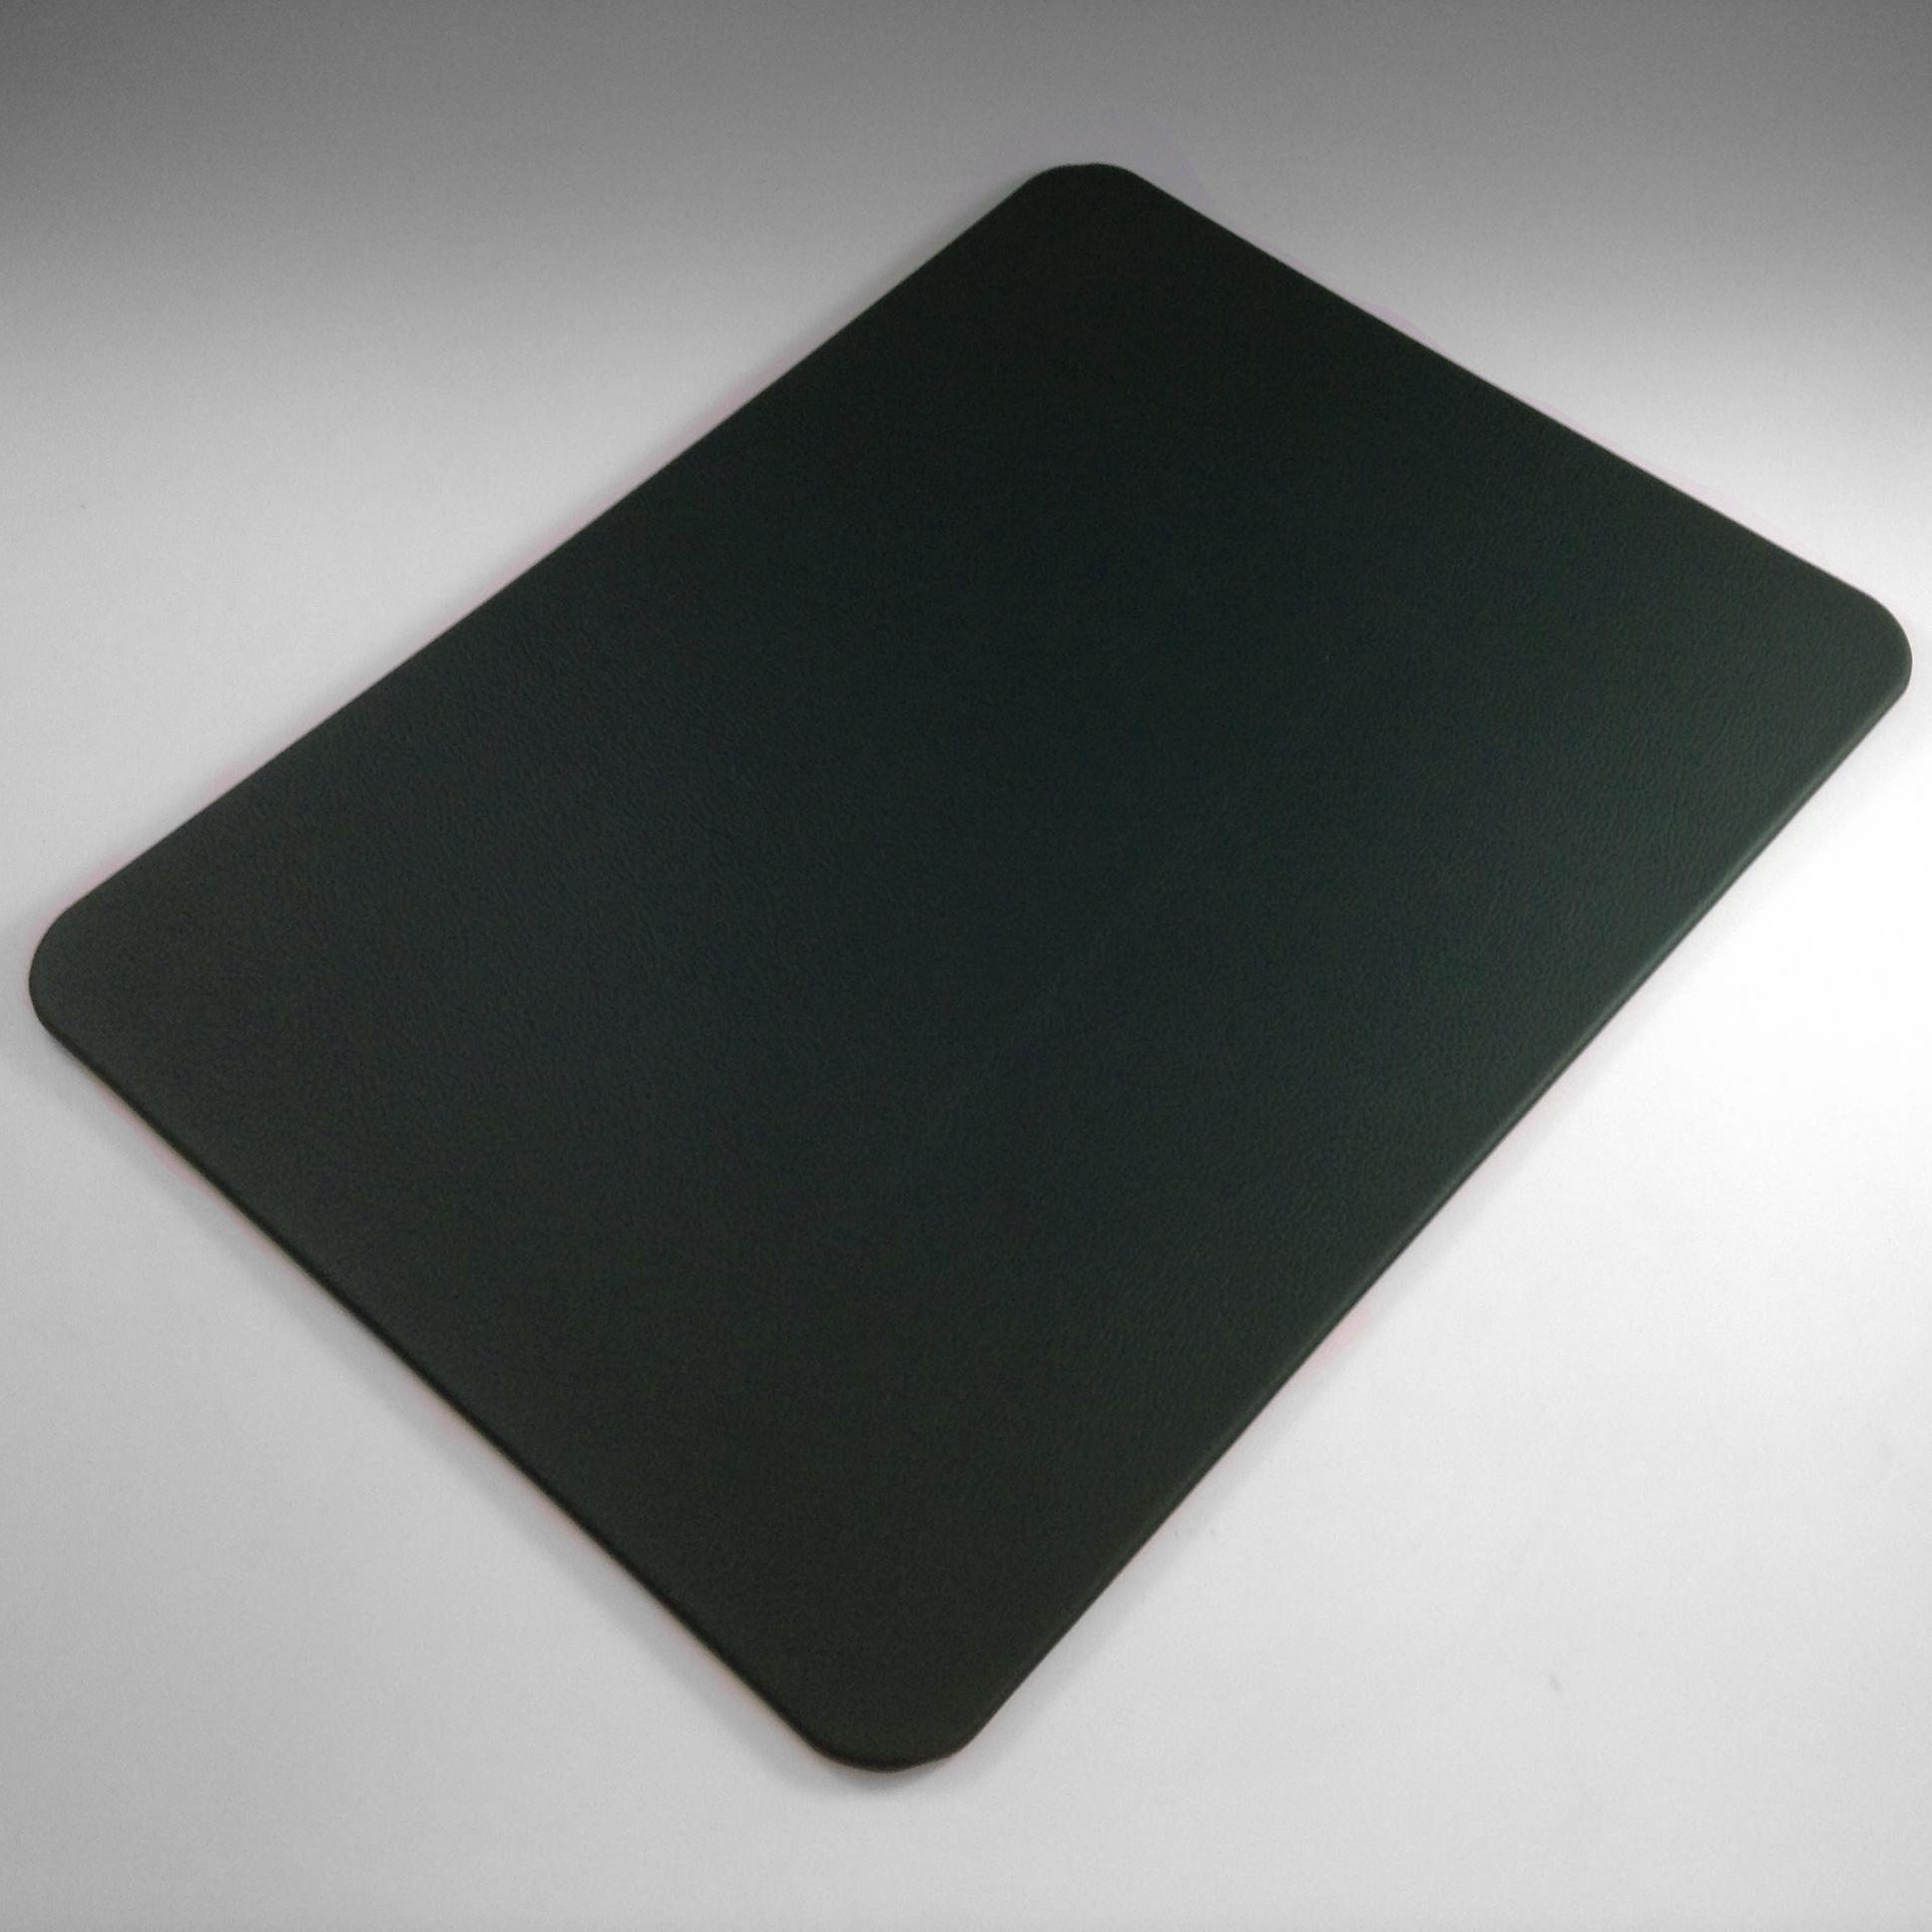 Dark Green Leather Desk Blotter  Desk Pads  Prestige Office